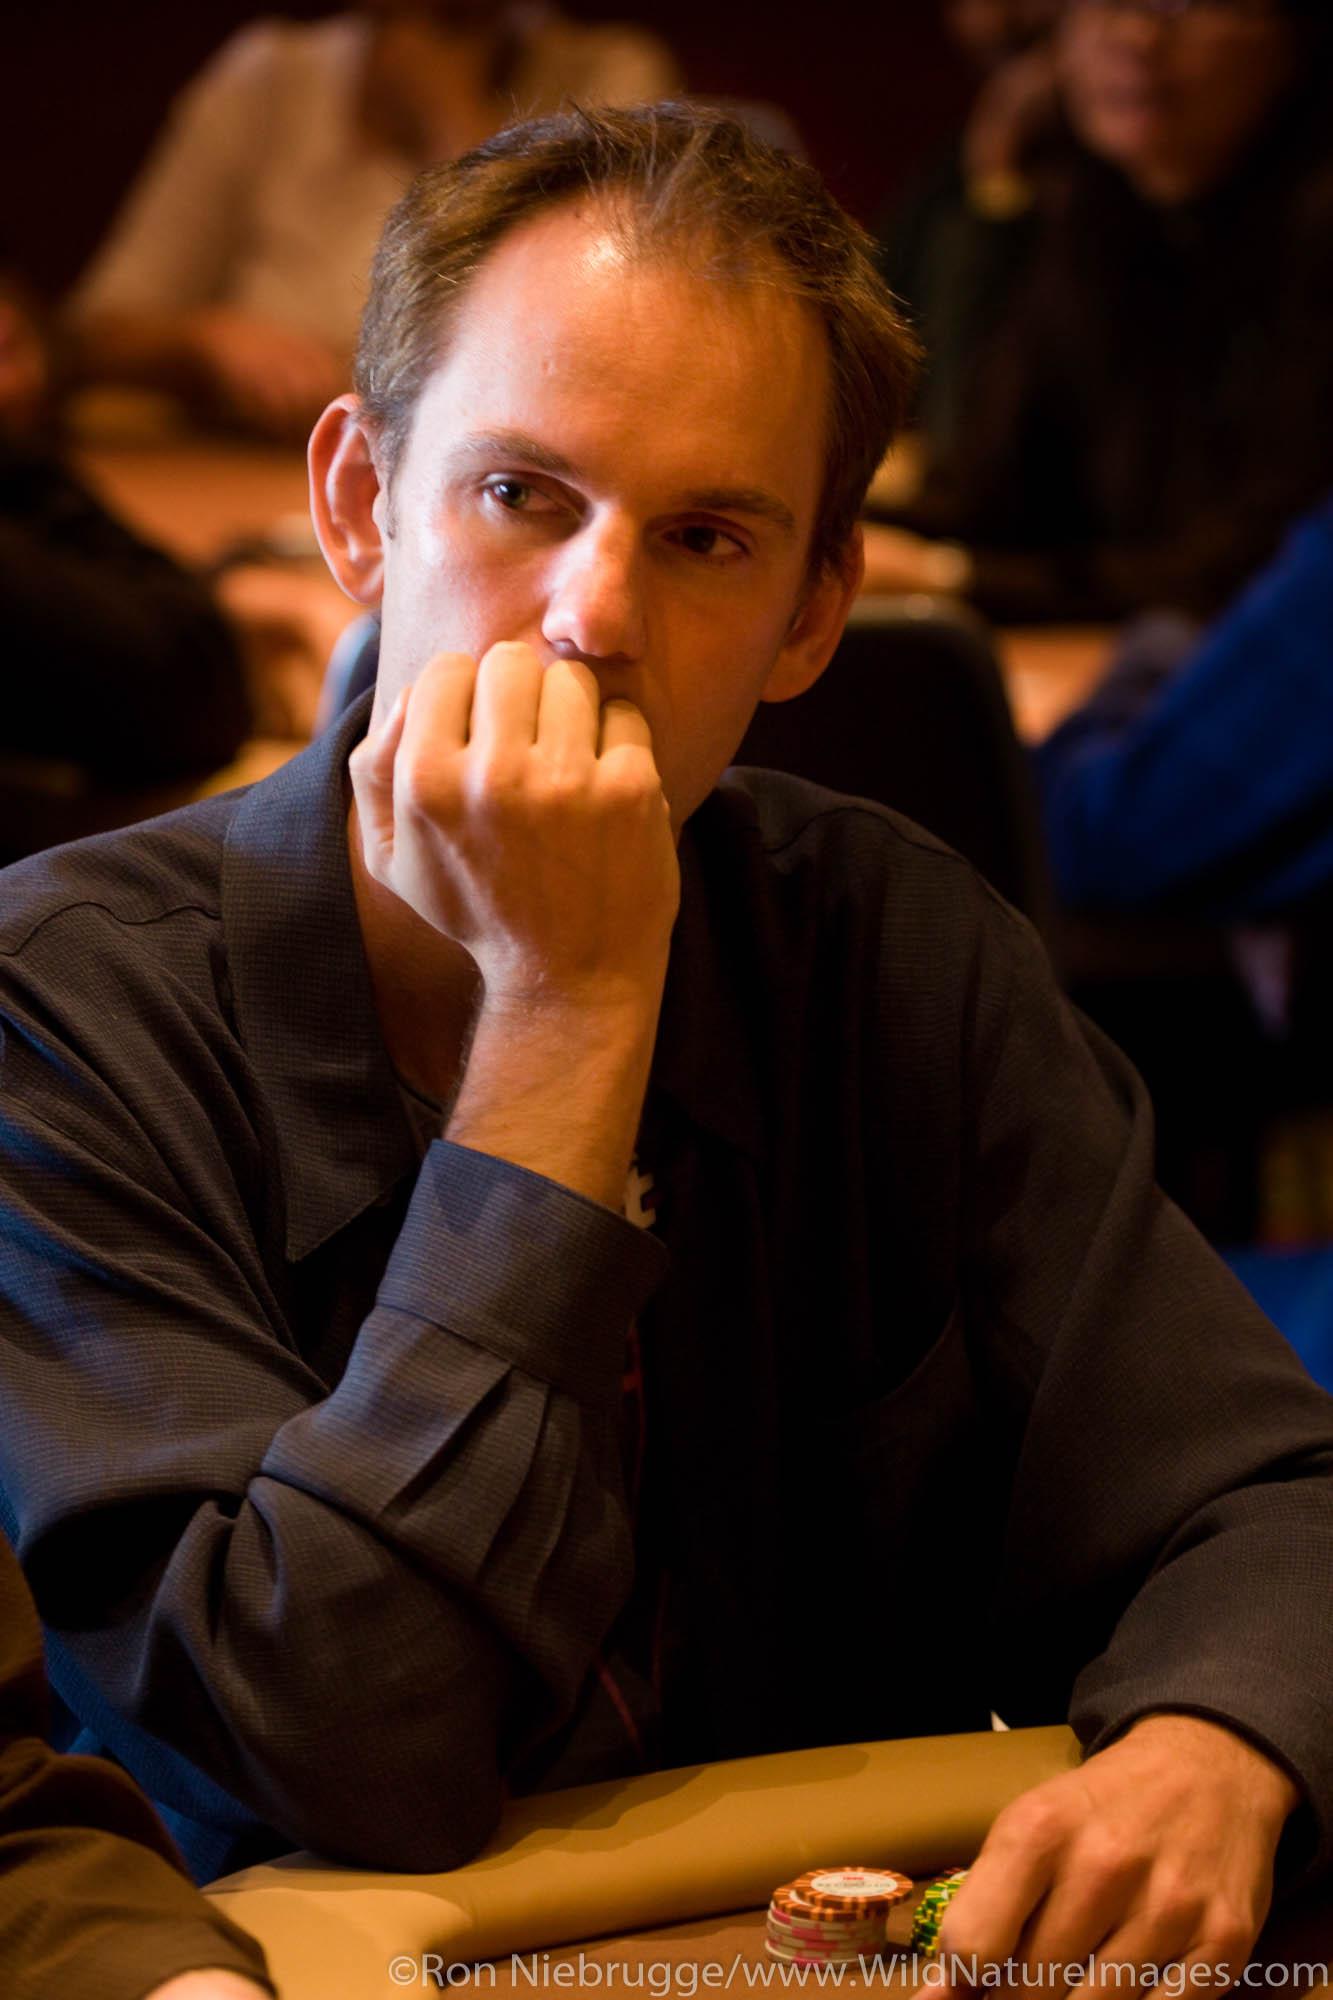 Allen Cunningham at the 2008 World Poker Tour Festa Al Lago poker tournament at the Bellagio Resort and Casino, Las Vegas, Nevada...